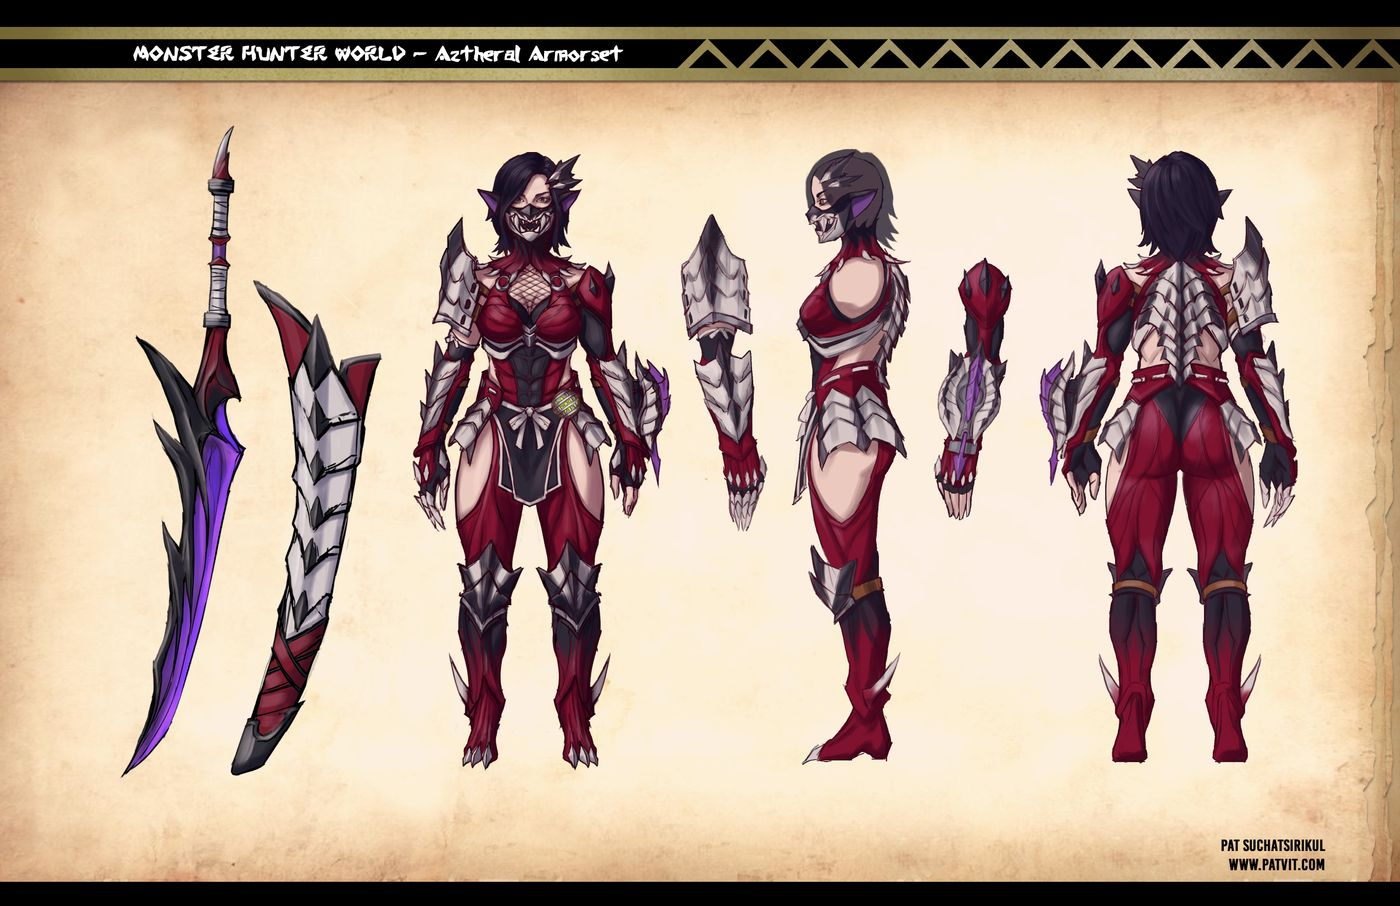 Suchatsirikul Pat Final Page12 Monster Hunter Aztheral Armorset Orthographic Patvit